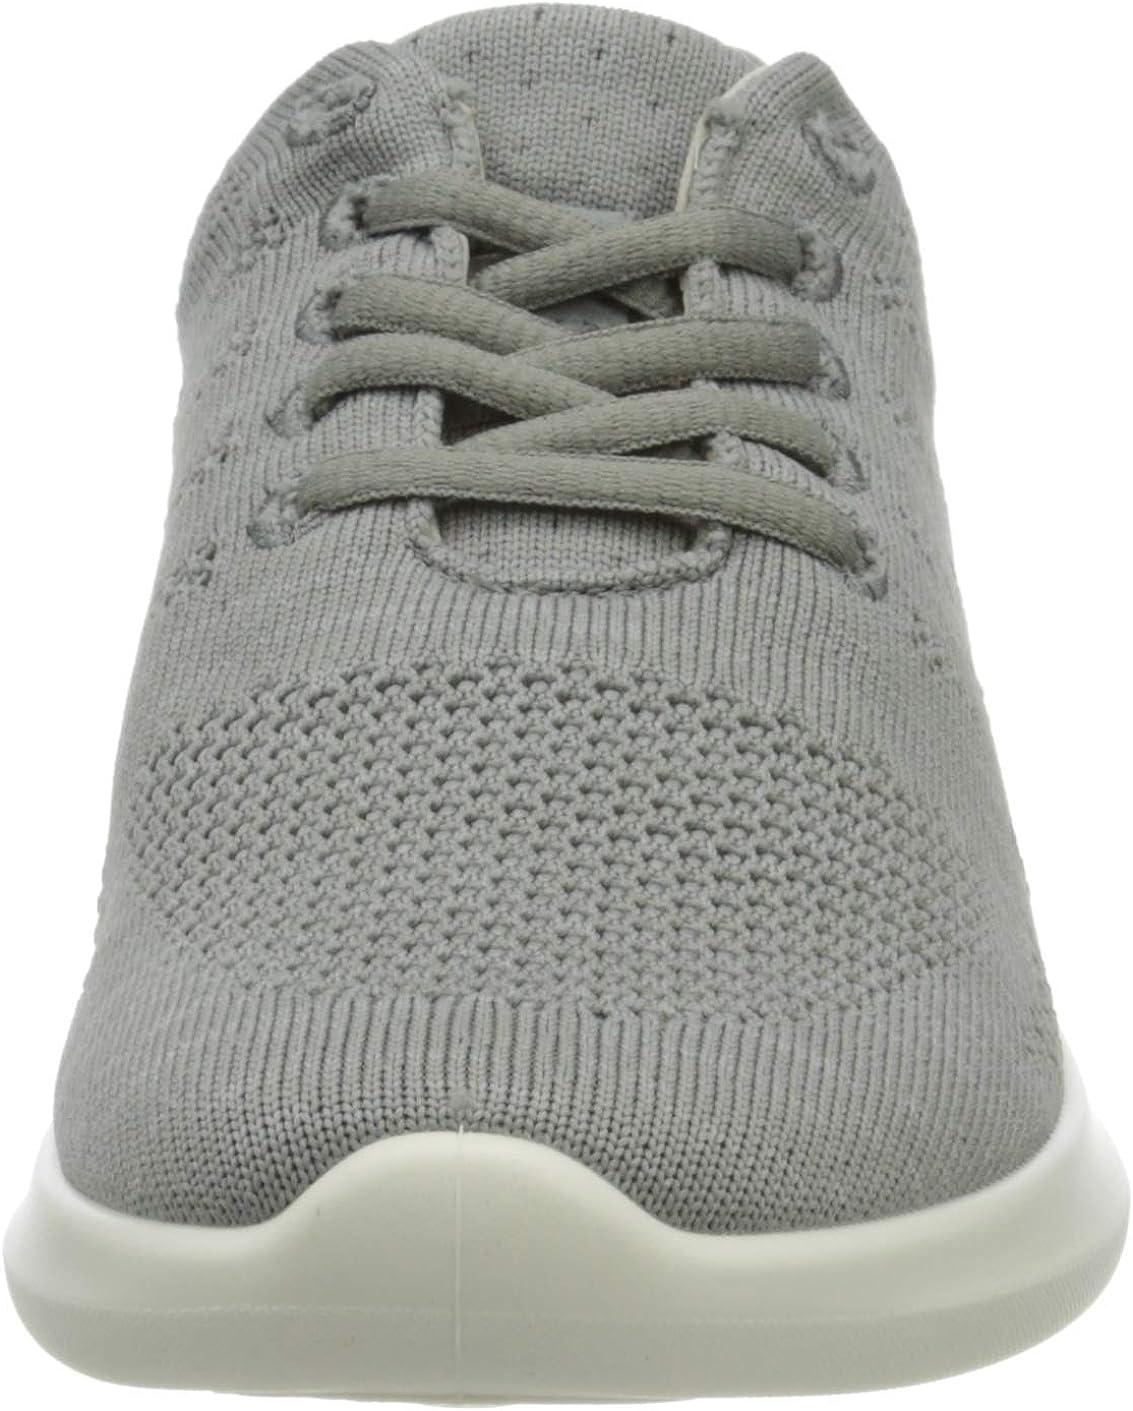 Hotter Women's Nova Sneaker Pebble Grey